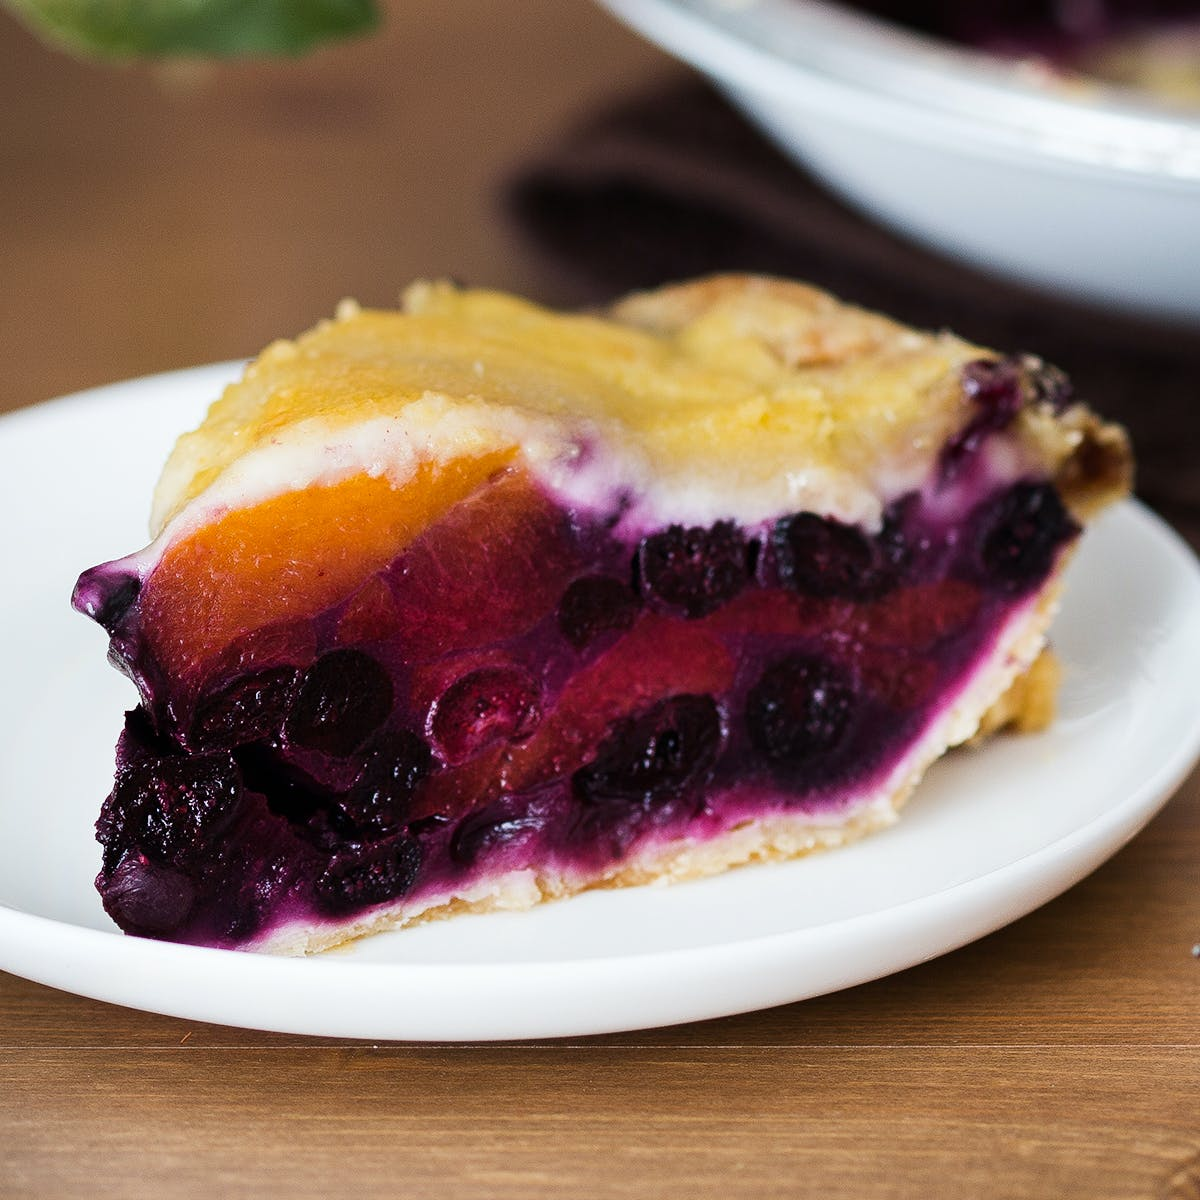 Blueberry Peach Pie By Estes Park Pie Shop Goldbelly